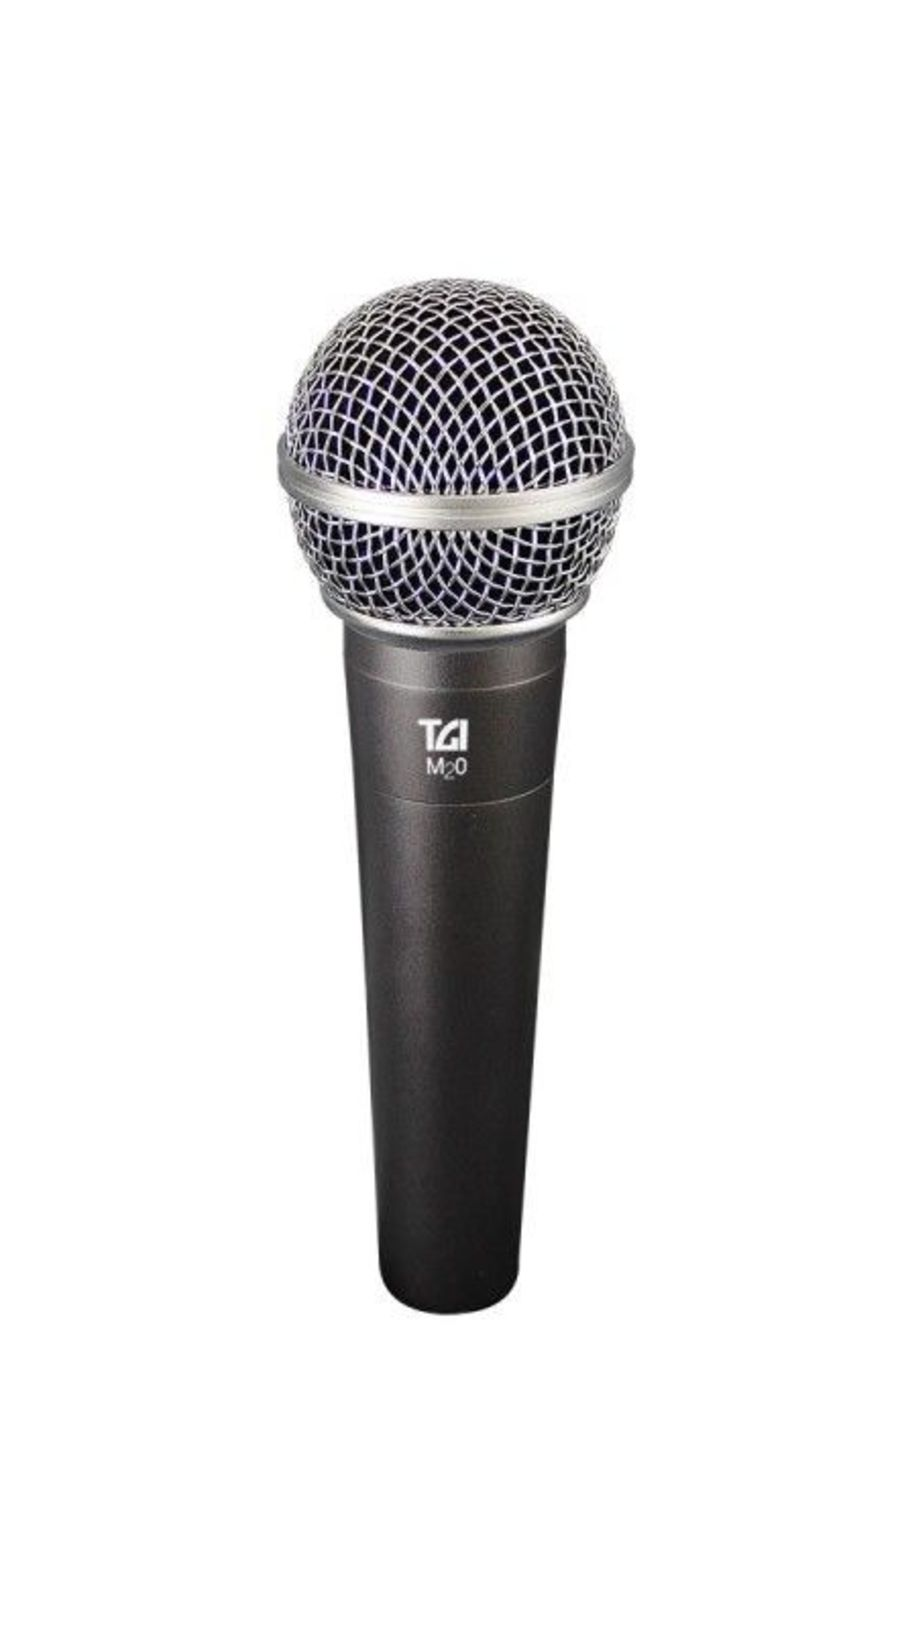 TGI M20 Dynamic Microphone